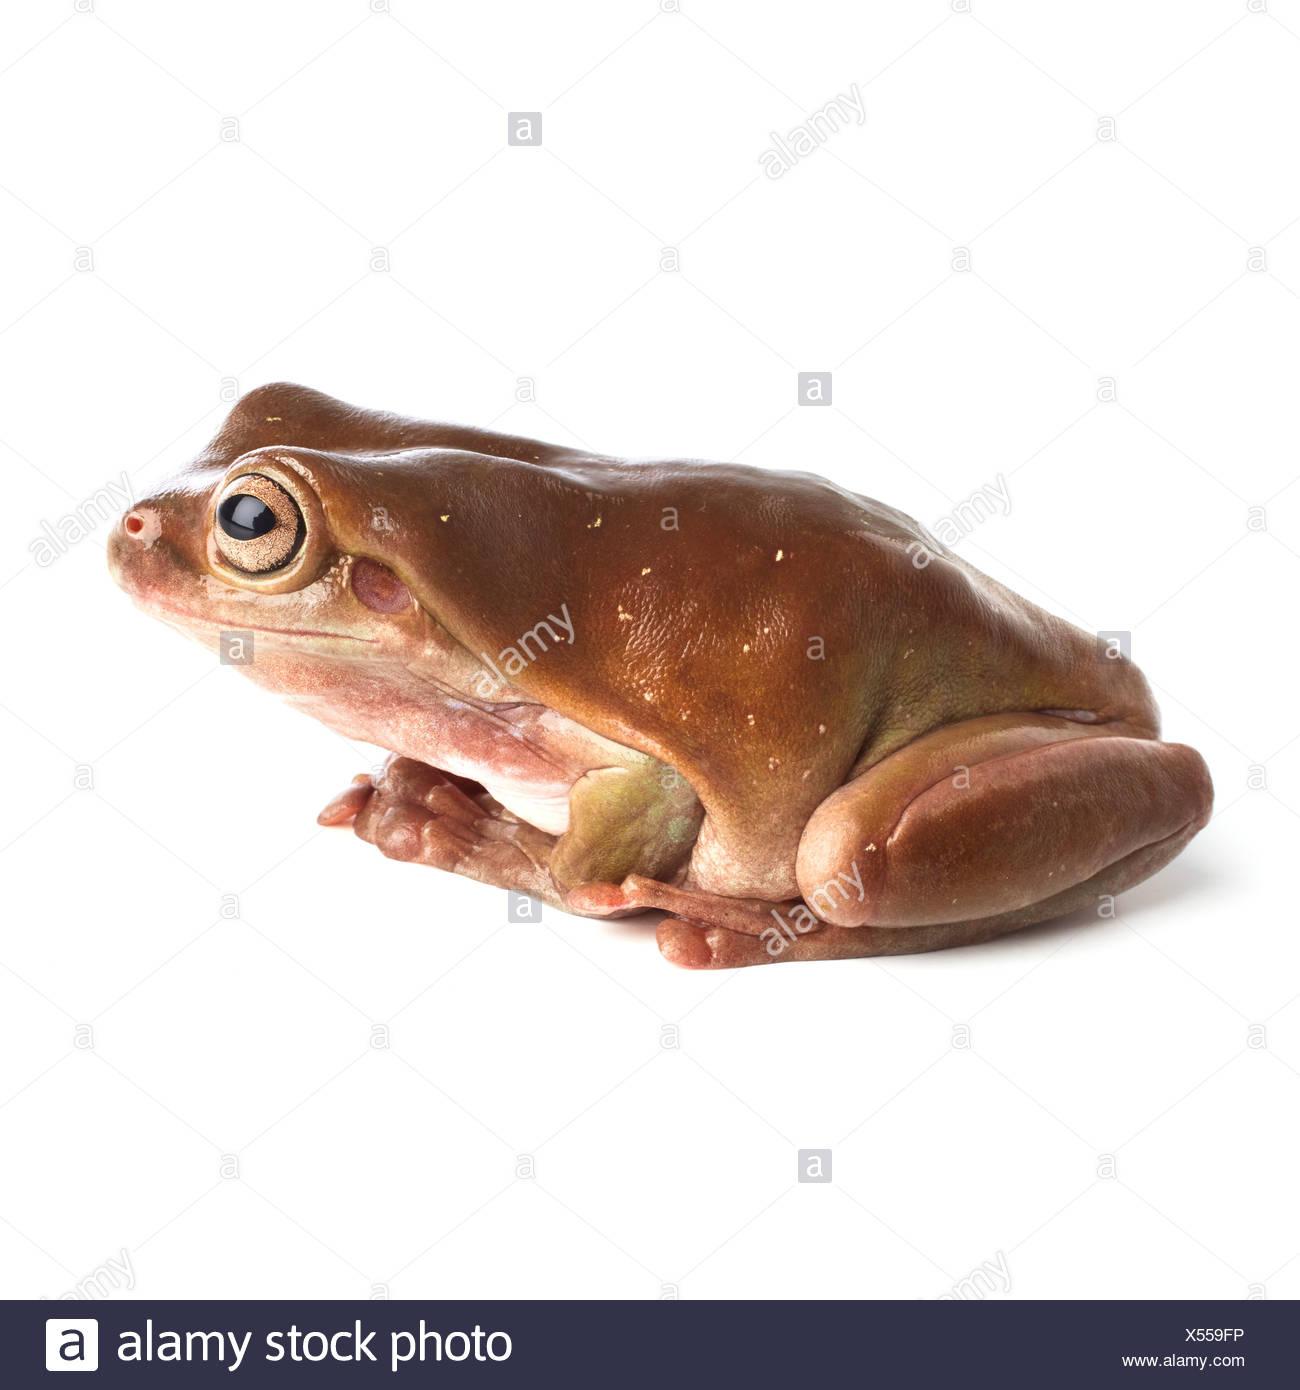 White's tree frog - Stock Image